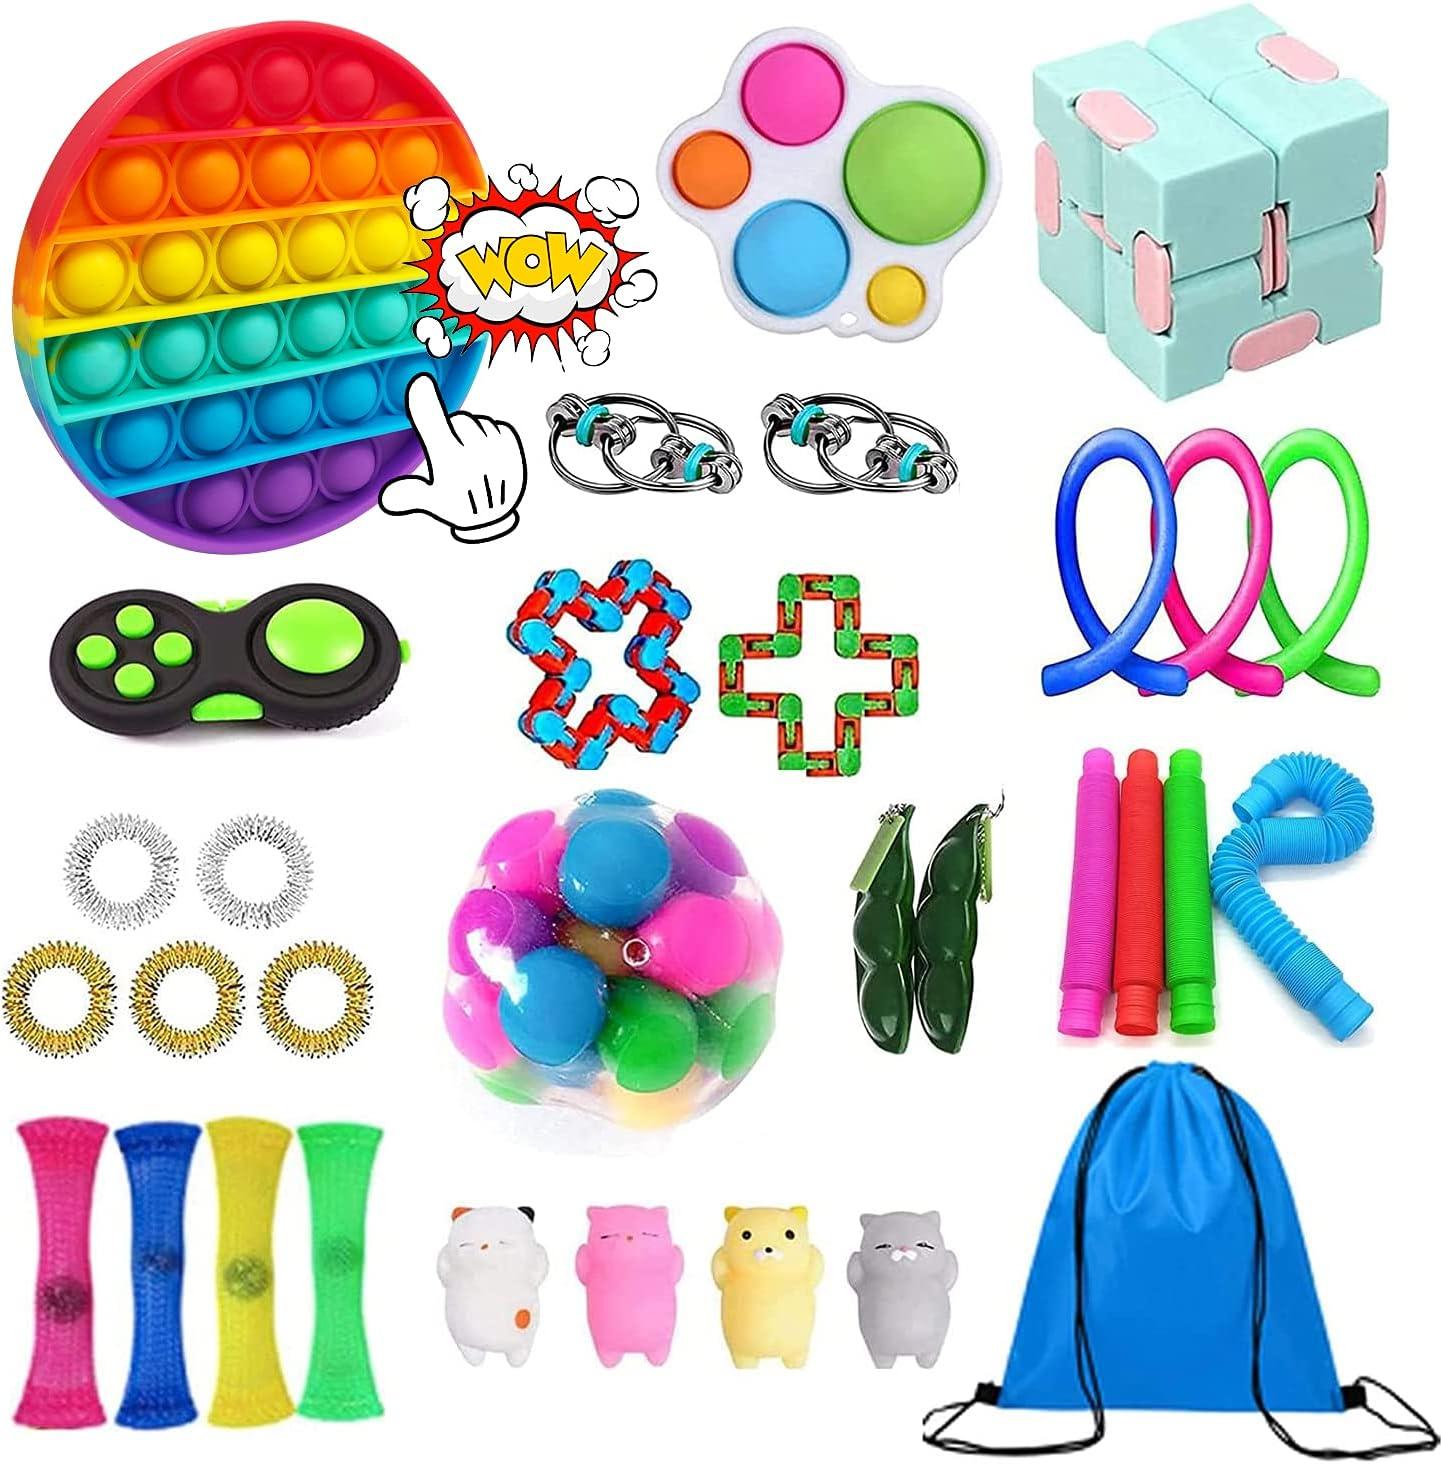 55% OFF OFFicial mail order Vivi90s Sensory Fidget Toys Set Reliev Stress Pack